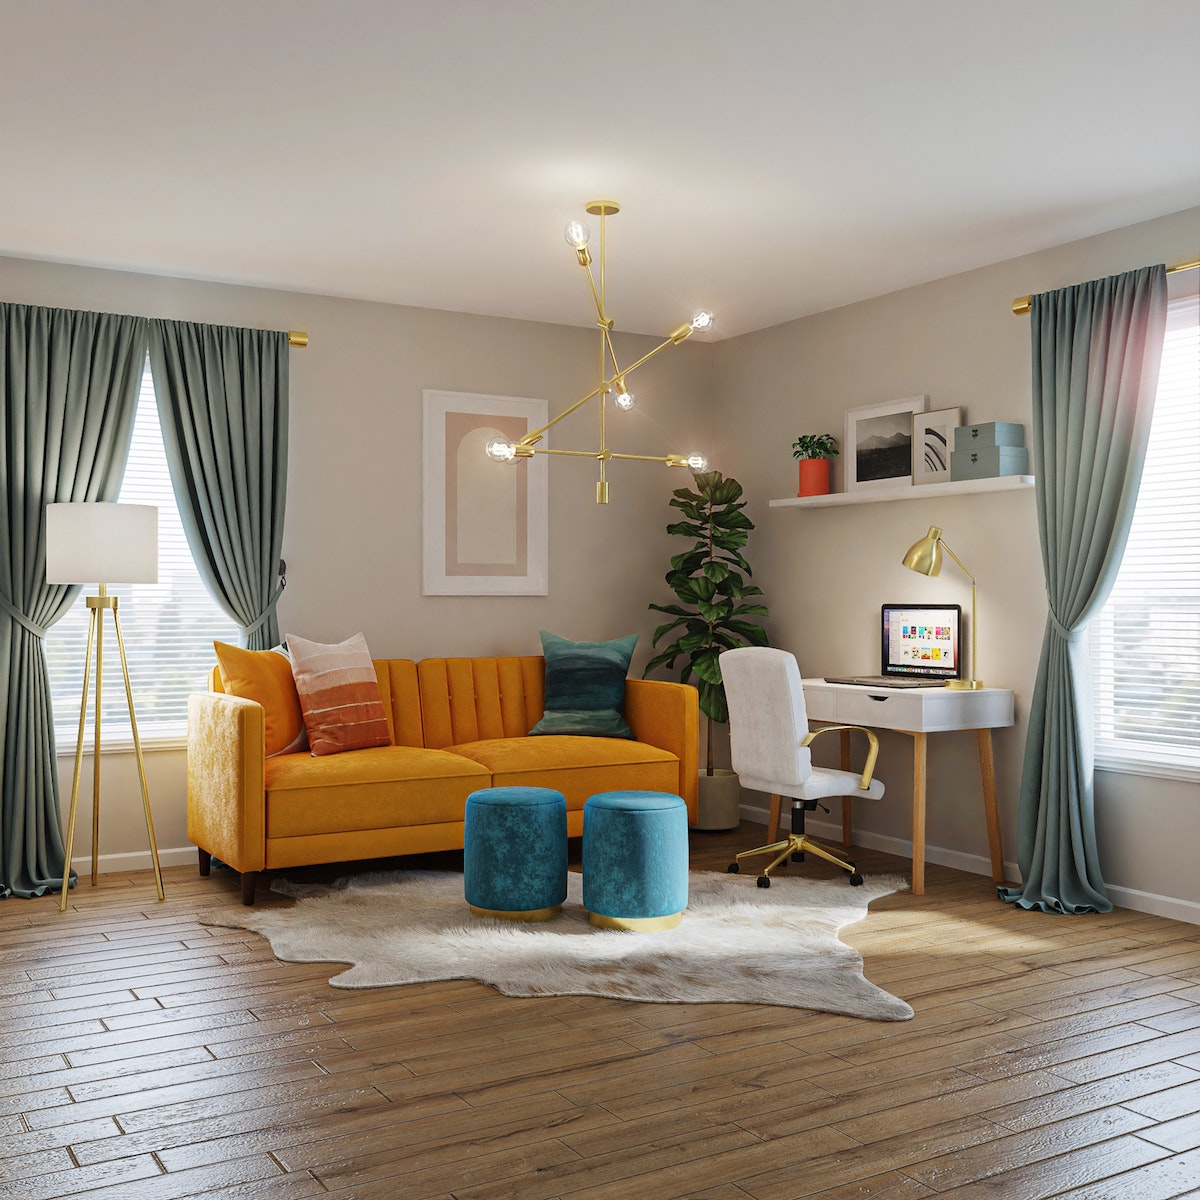 Small Orange Sofa